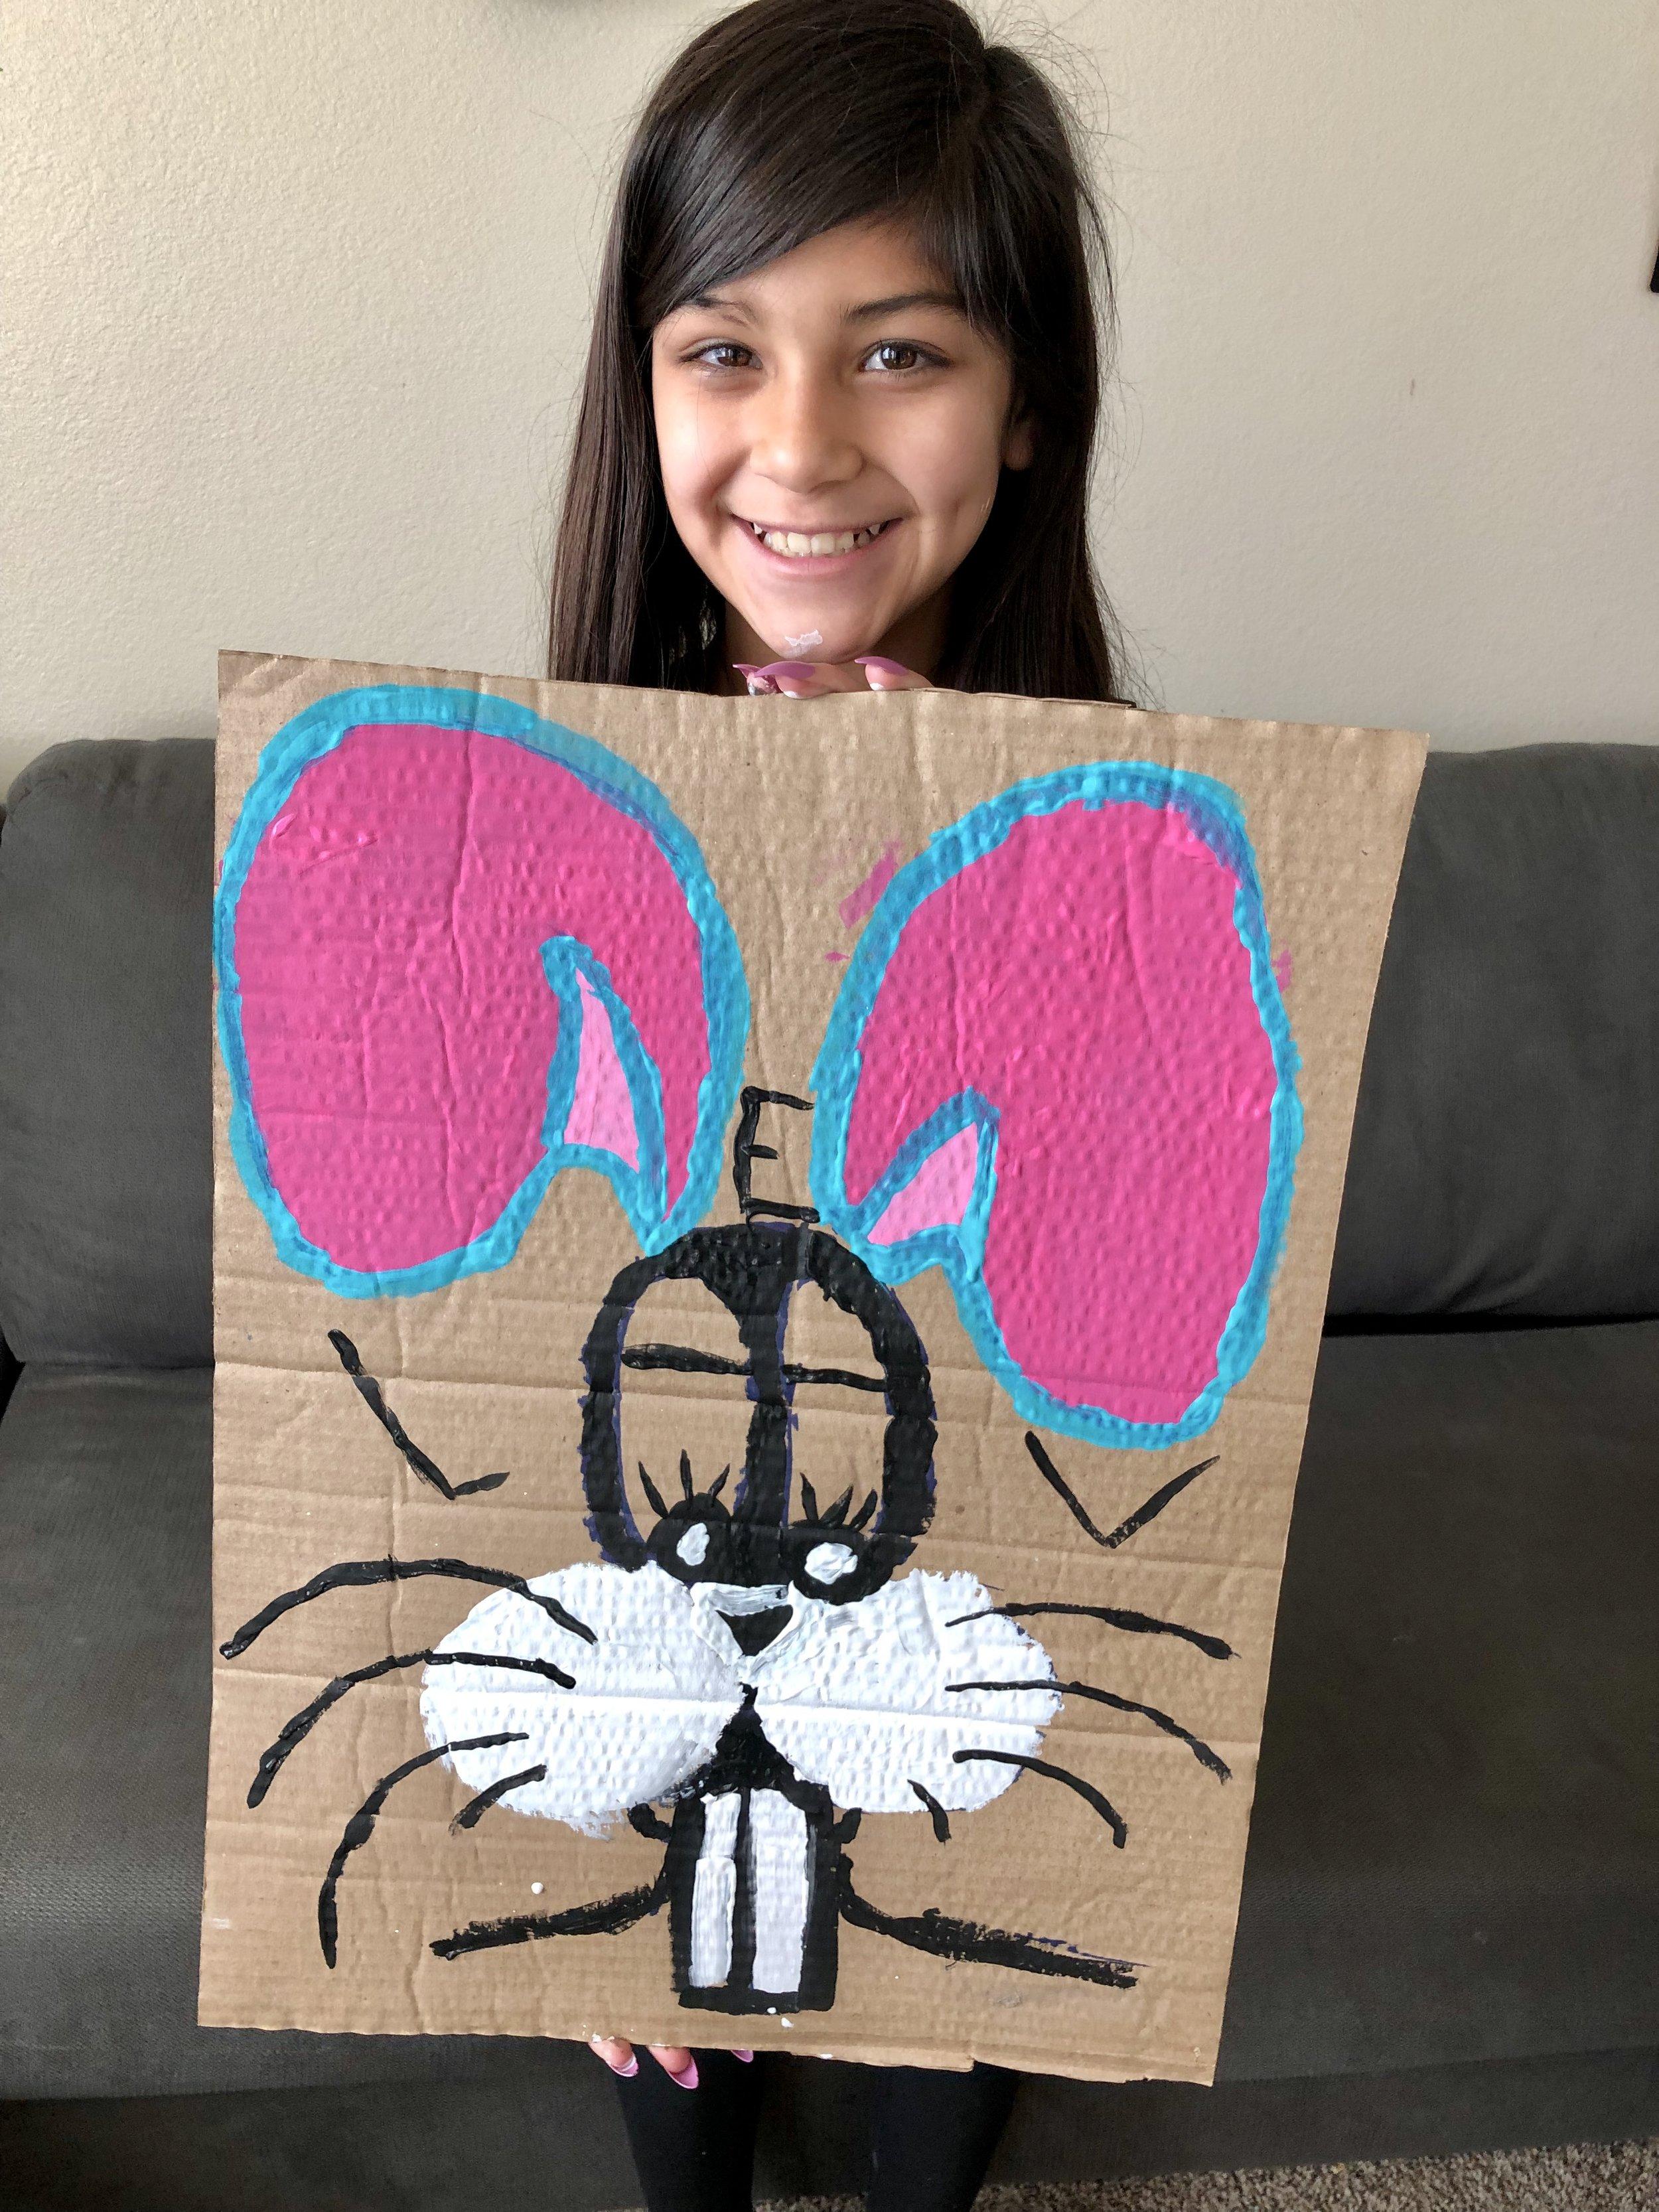 Dave drew his signature rabbit for Kasie's daughter.